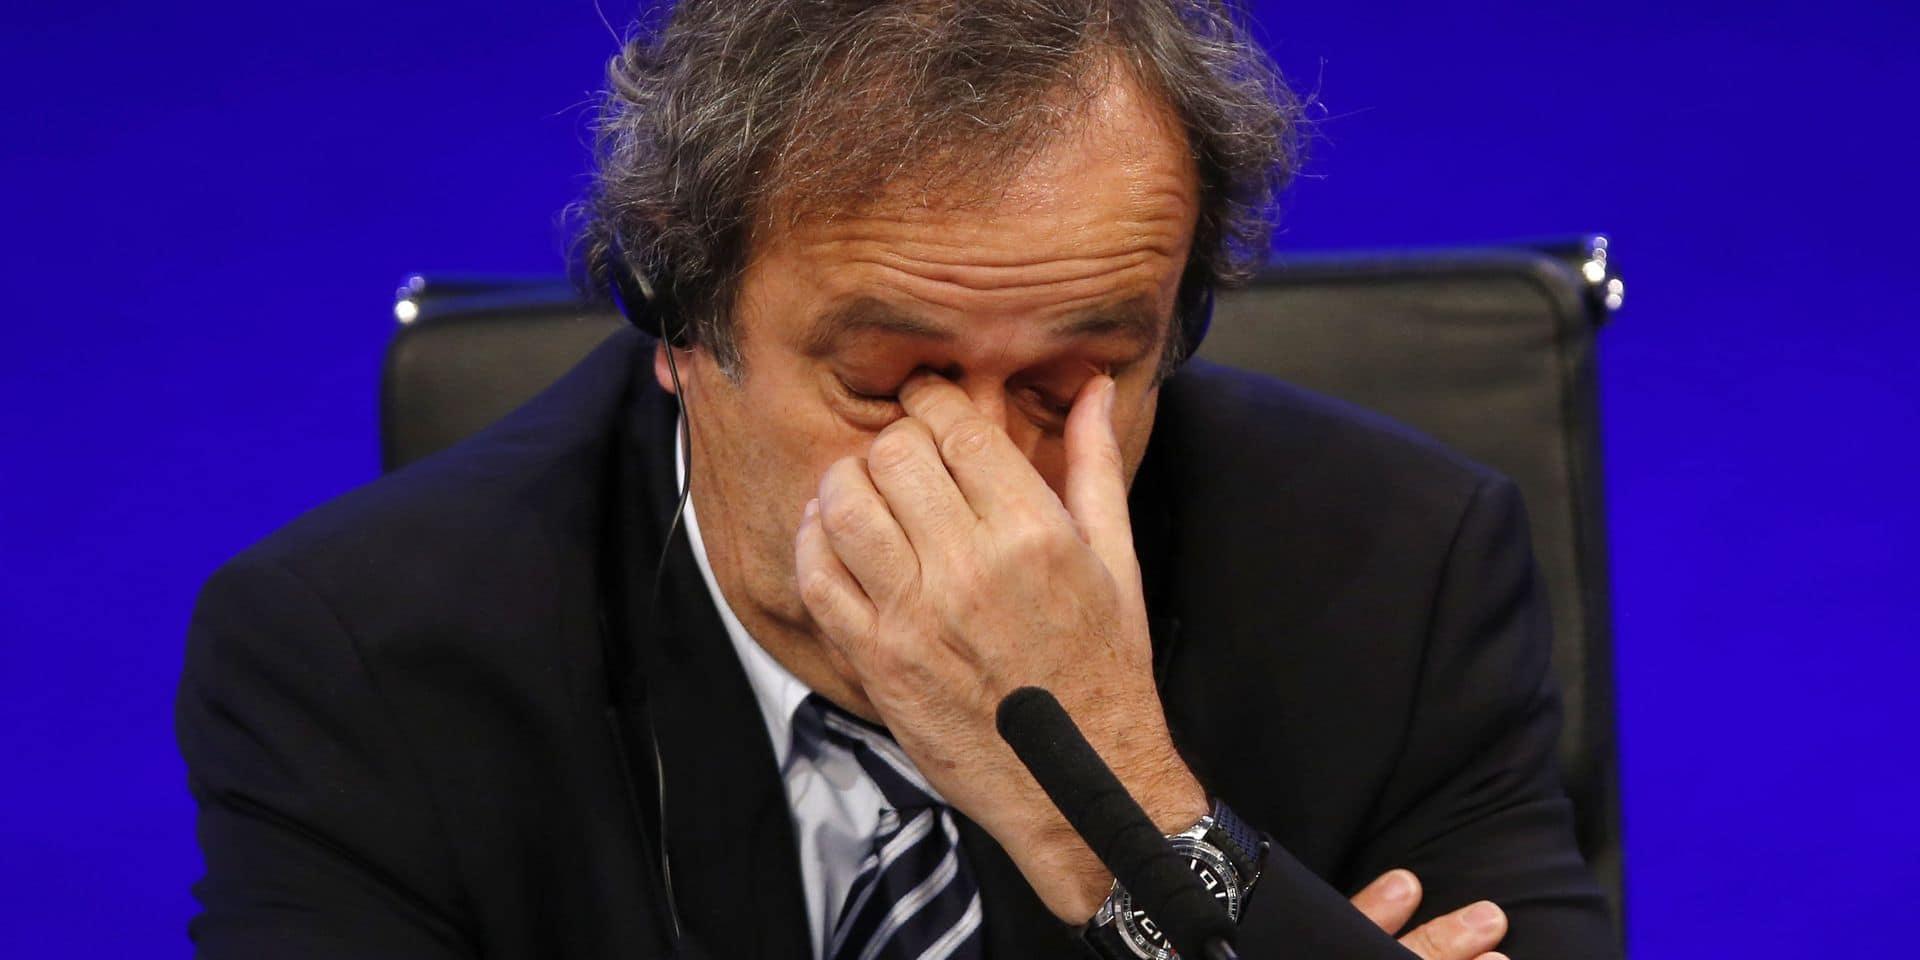 Platini, un roman judiciaire